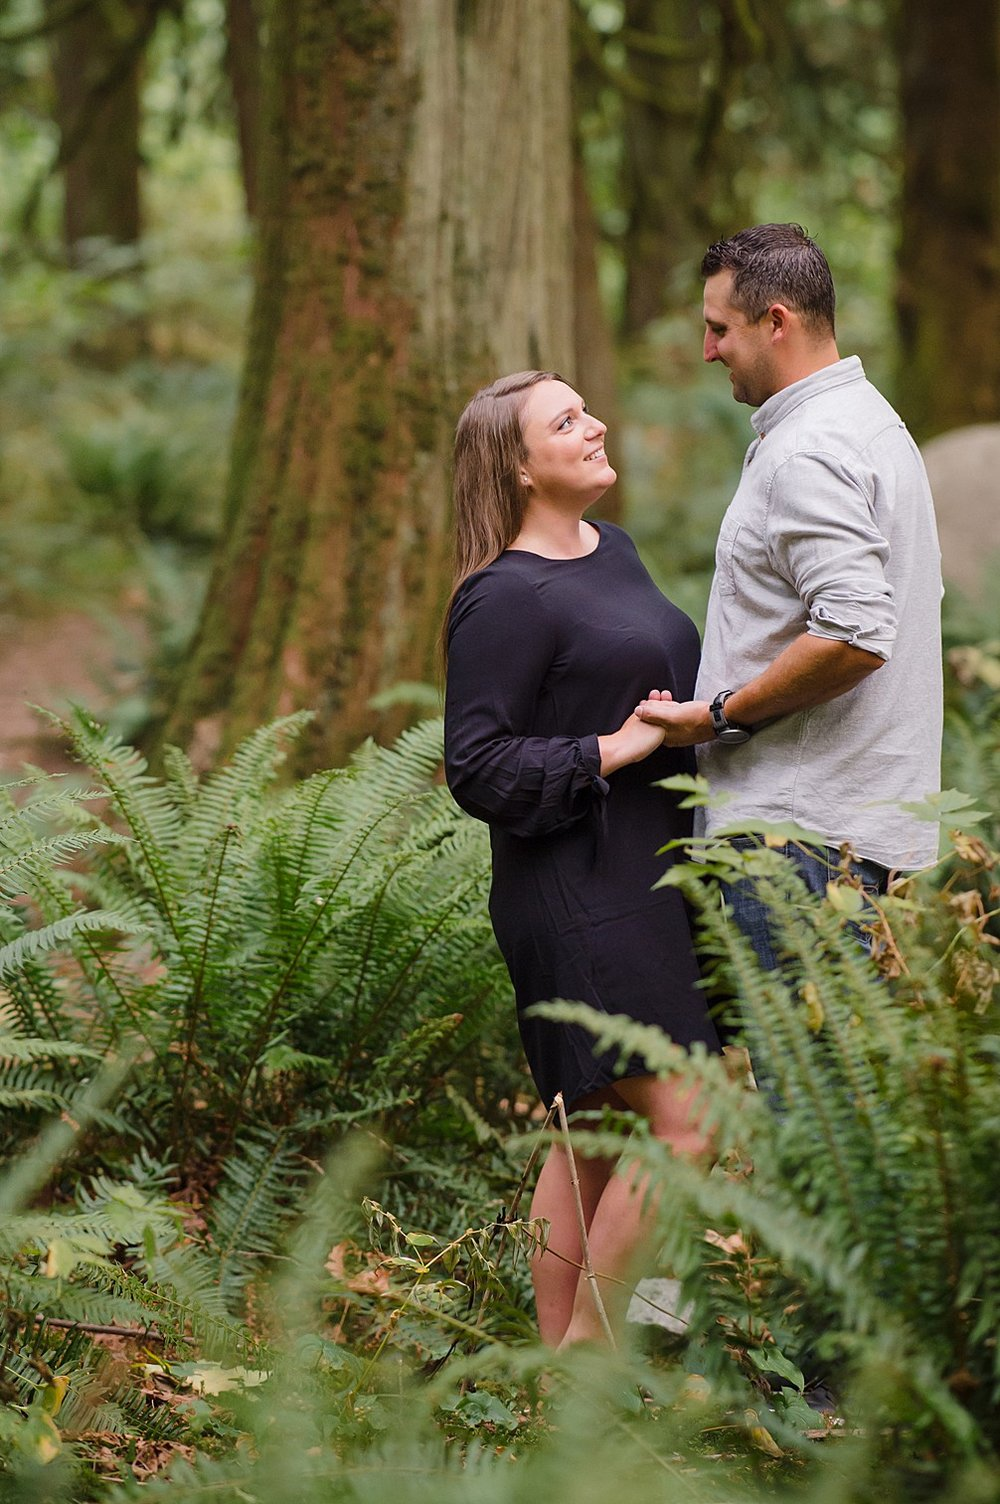 vancouver-engagement-couple-lynn-canyon-wedding-photography-lisa-lander-outdoor-photographer_4288.jpg